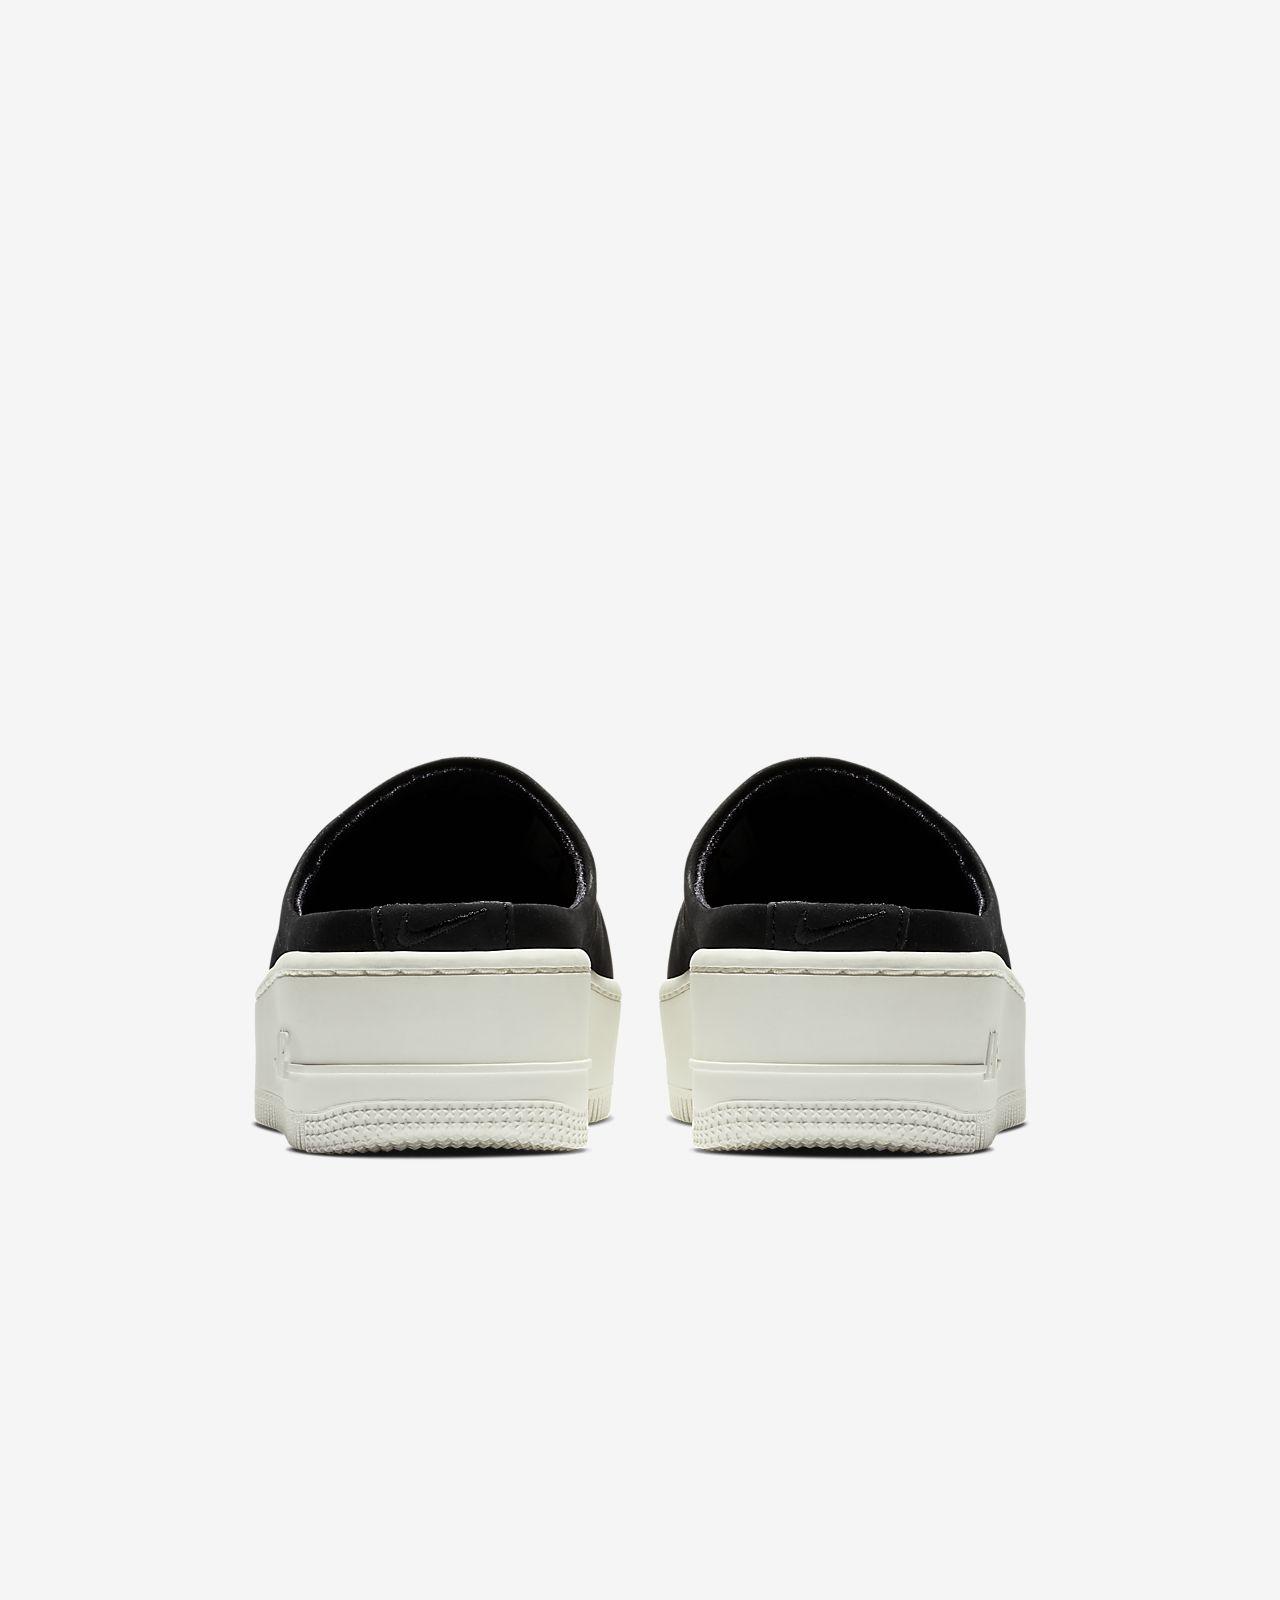 best service 81166 486e0 ... Nike Air Force 1 Lover XX Premium Women s Shoe